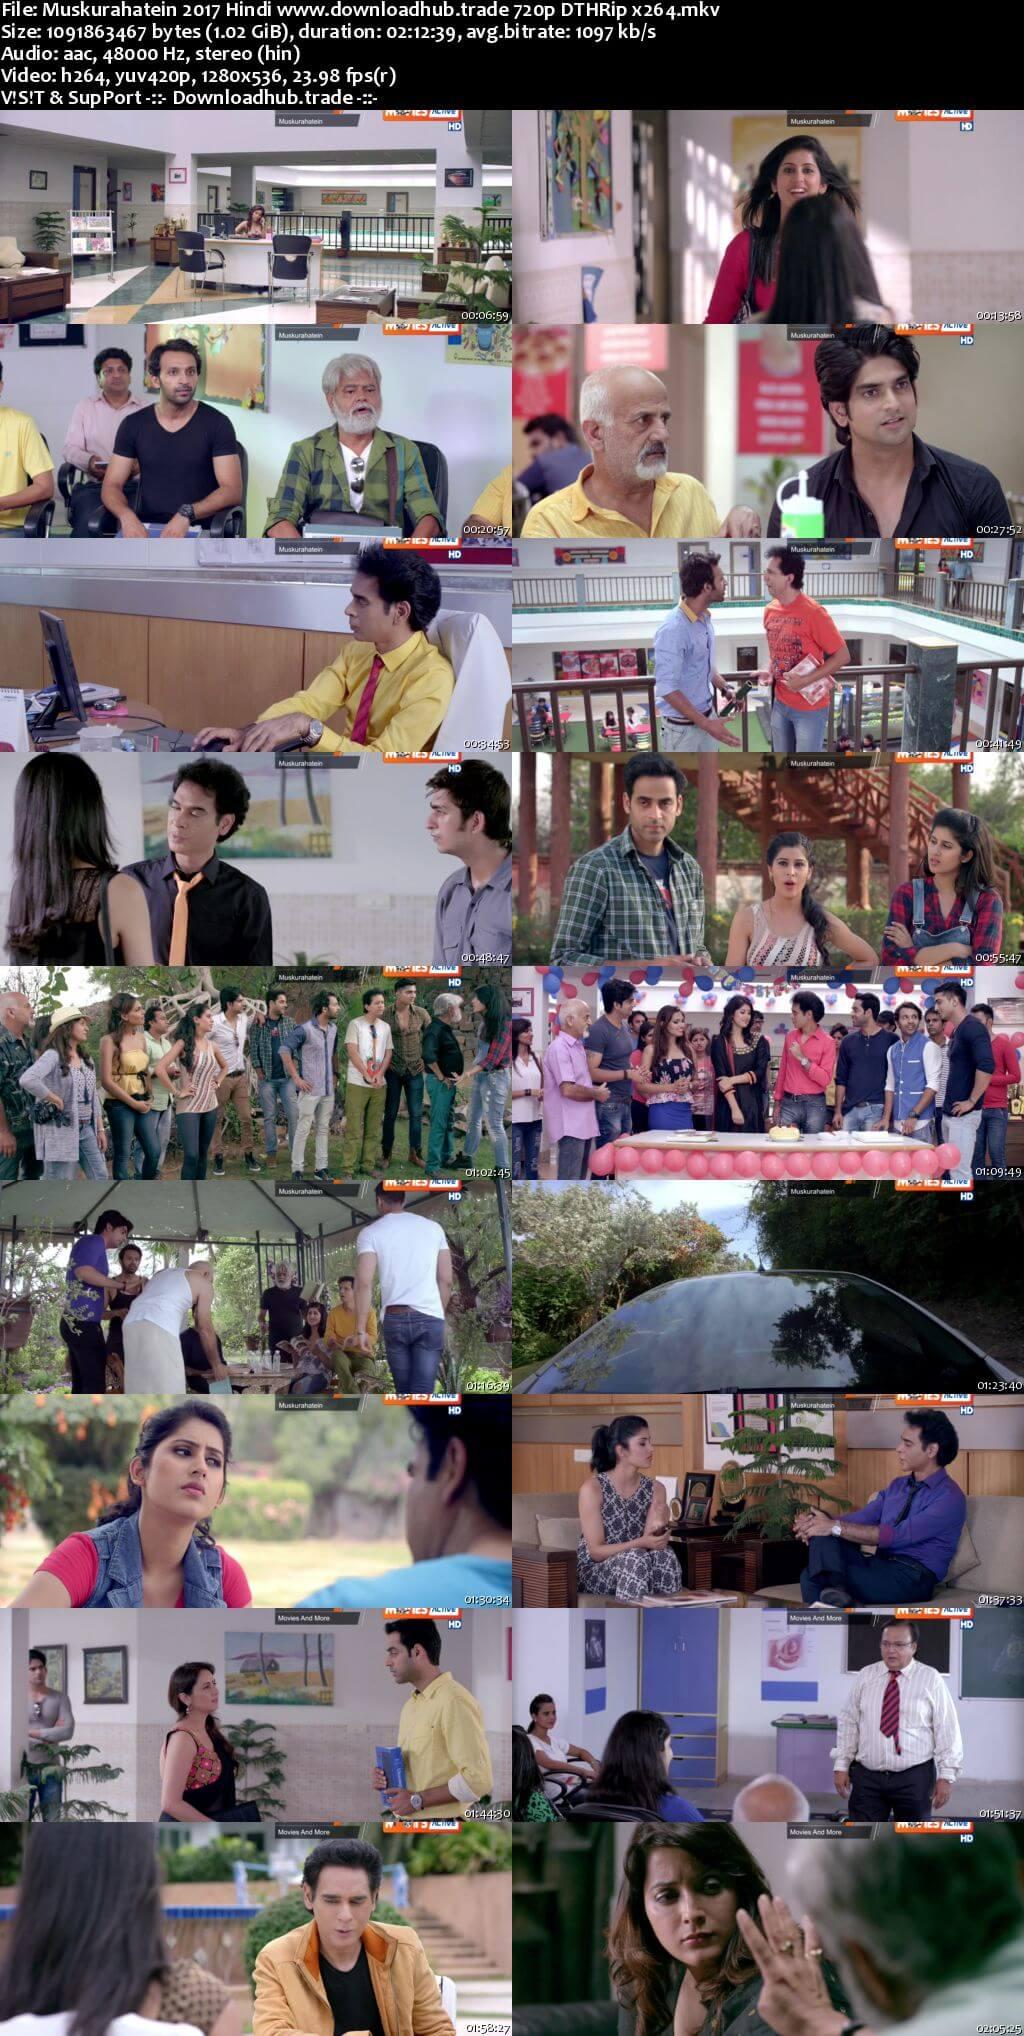 Muskurahatein 2017 Hindi 720p DTHRip x264